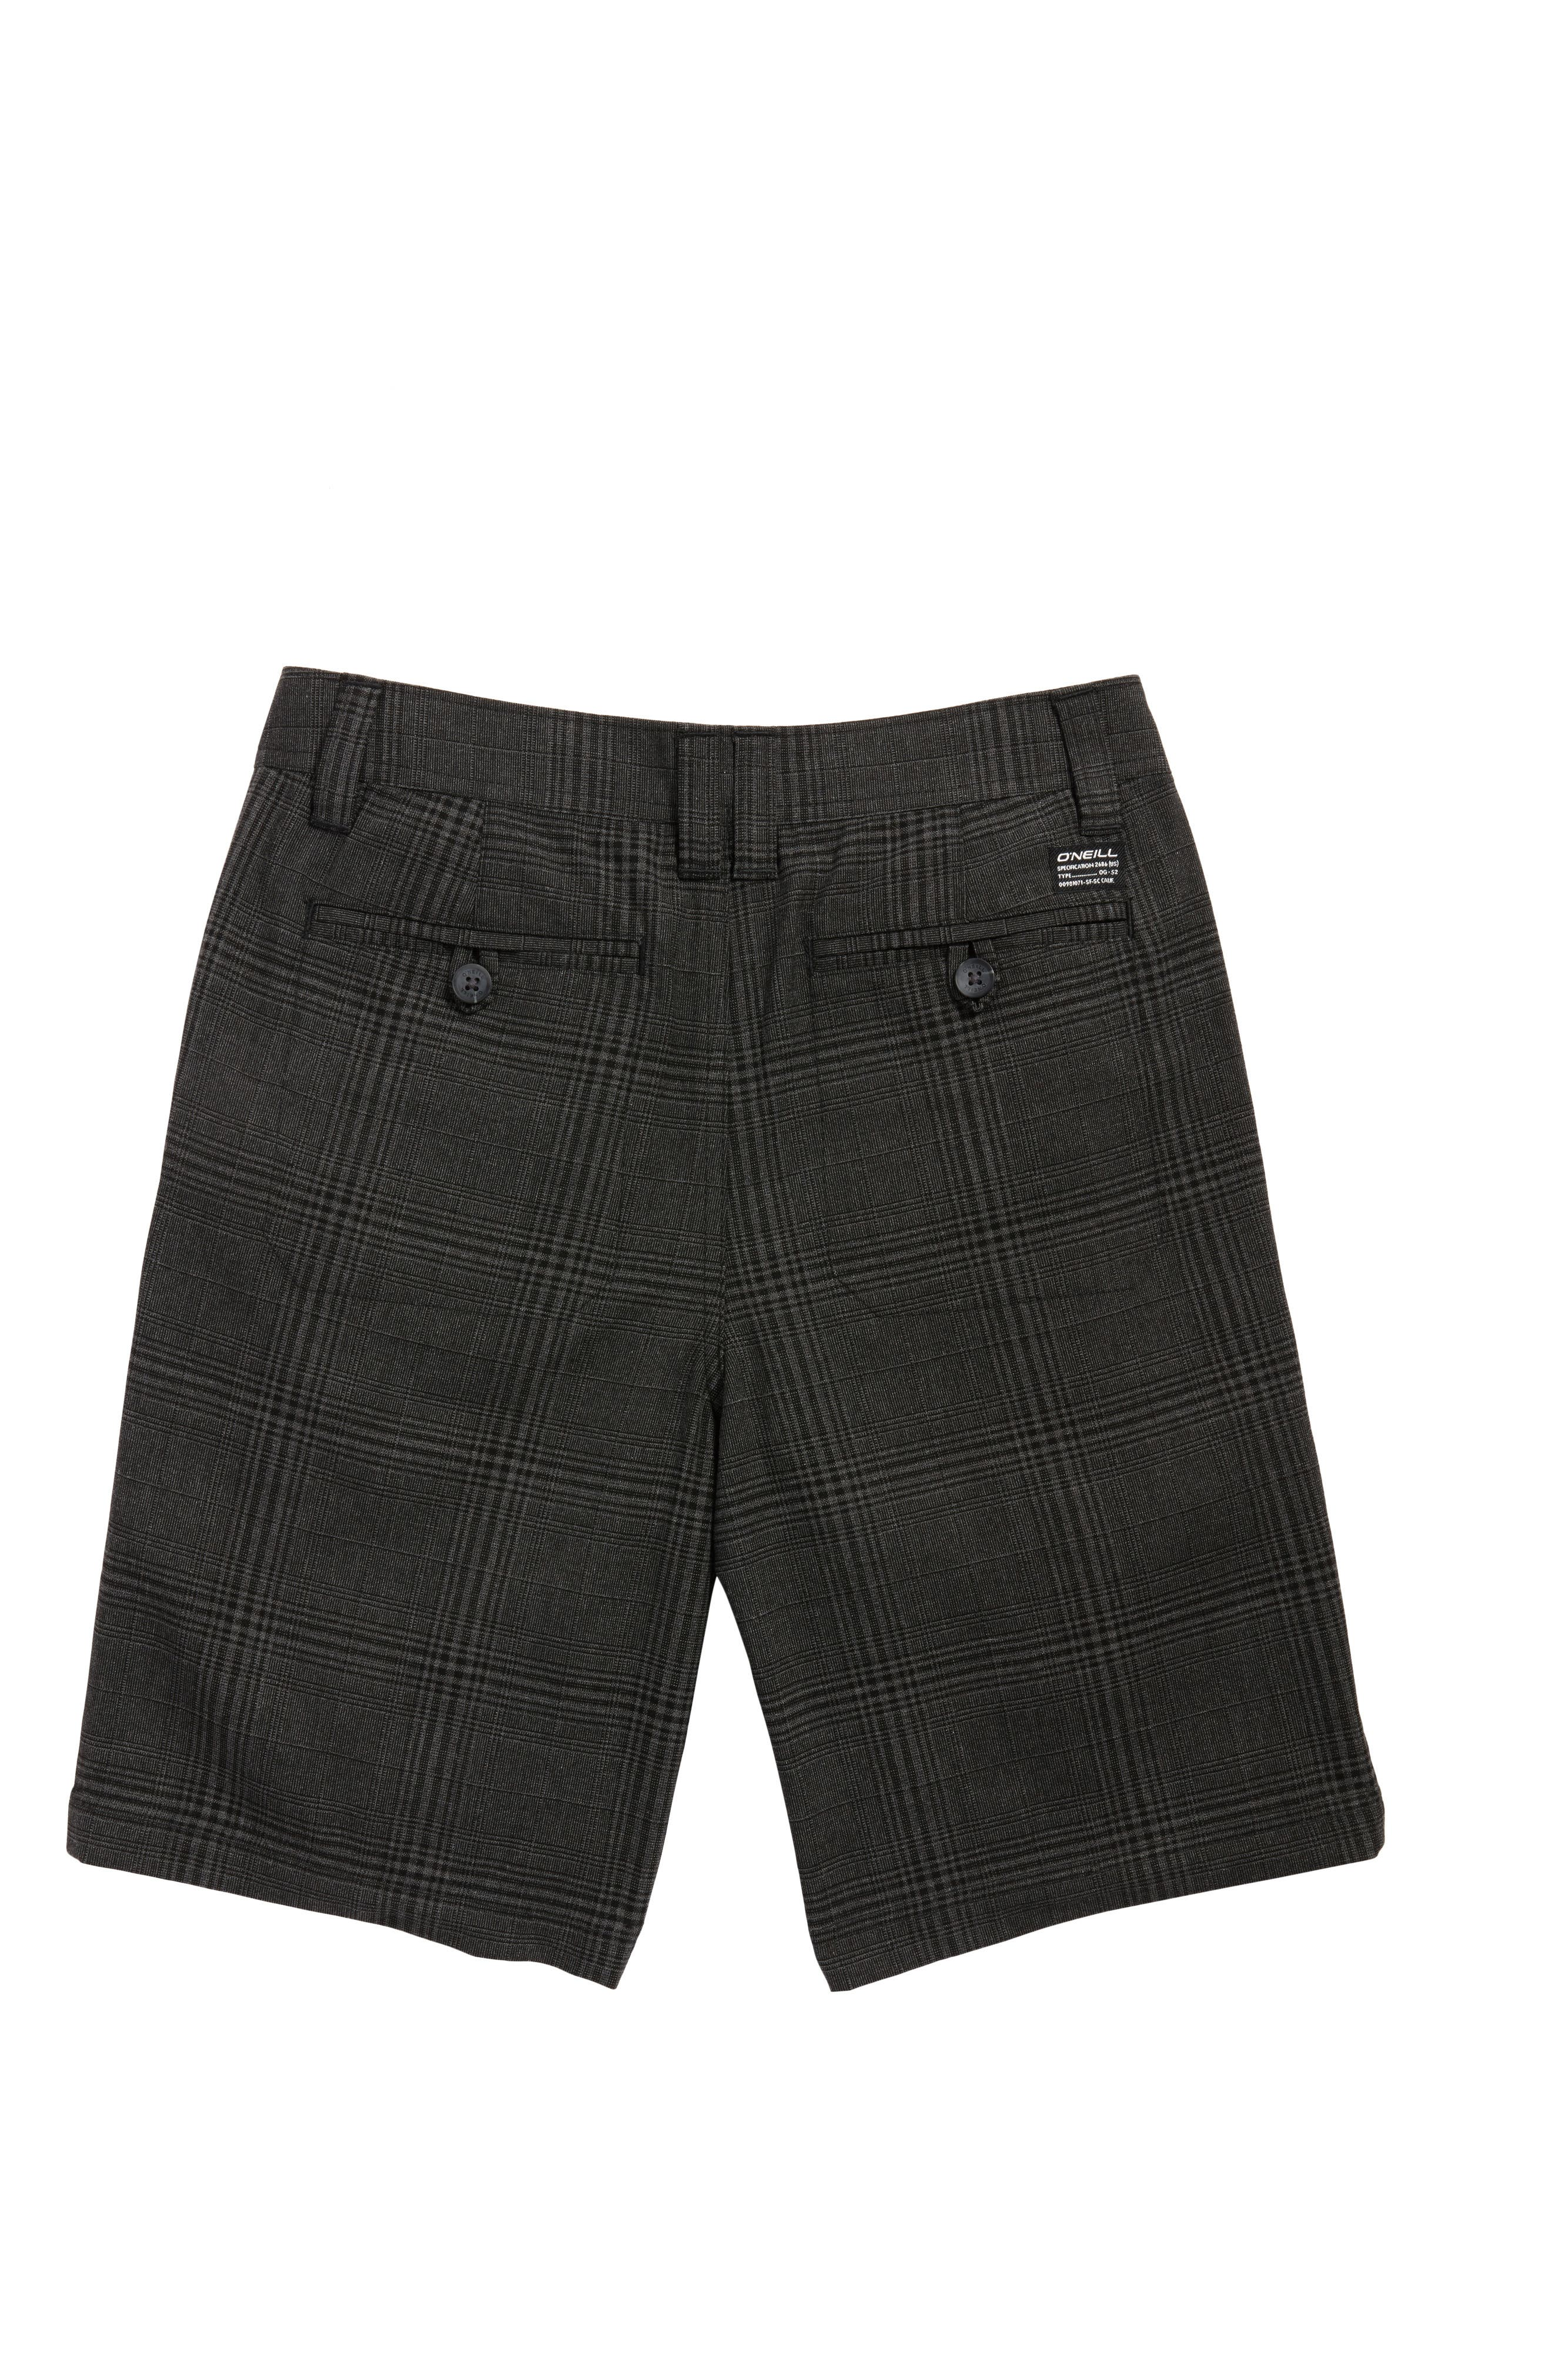 Bristol Plaid Shorts,                             Alternate thumbnail 4, color,                             001